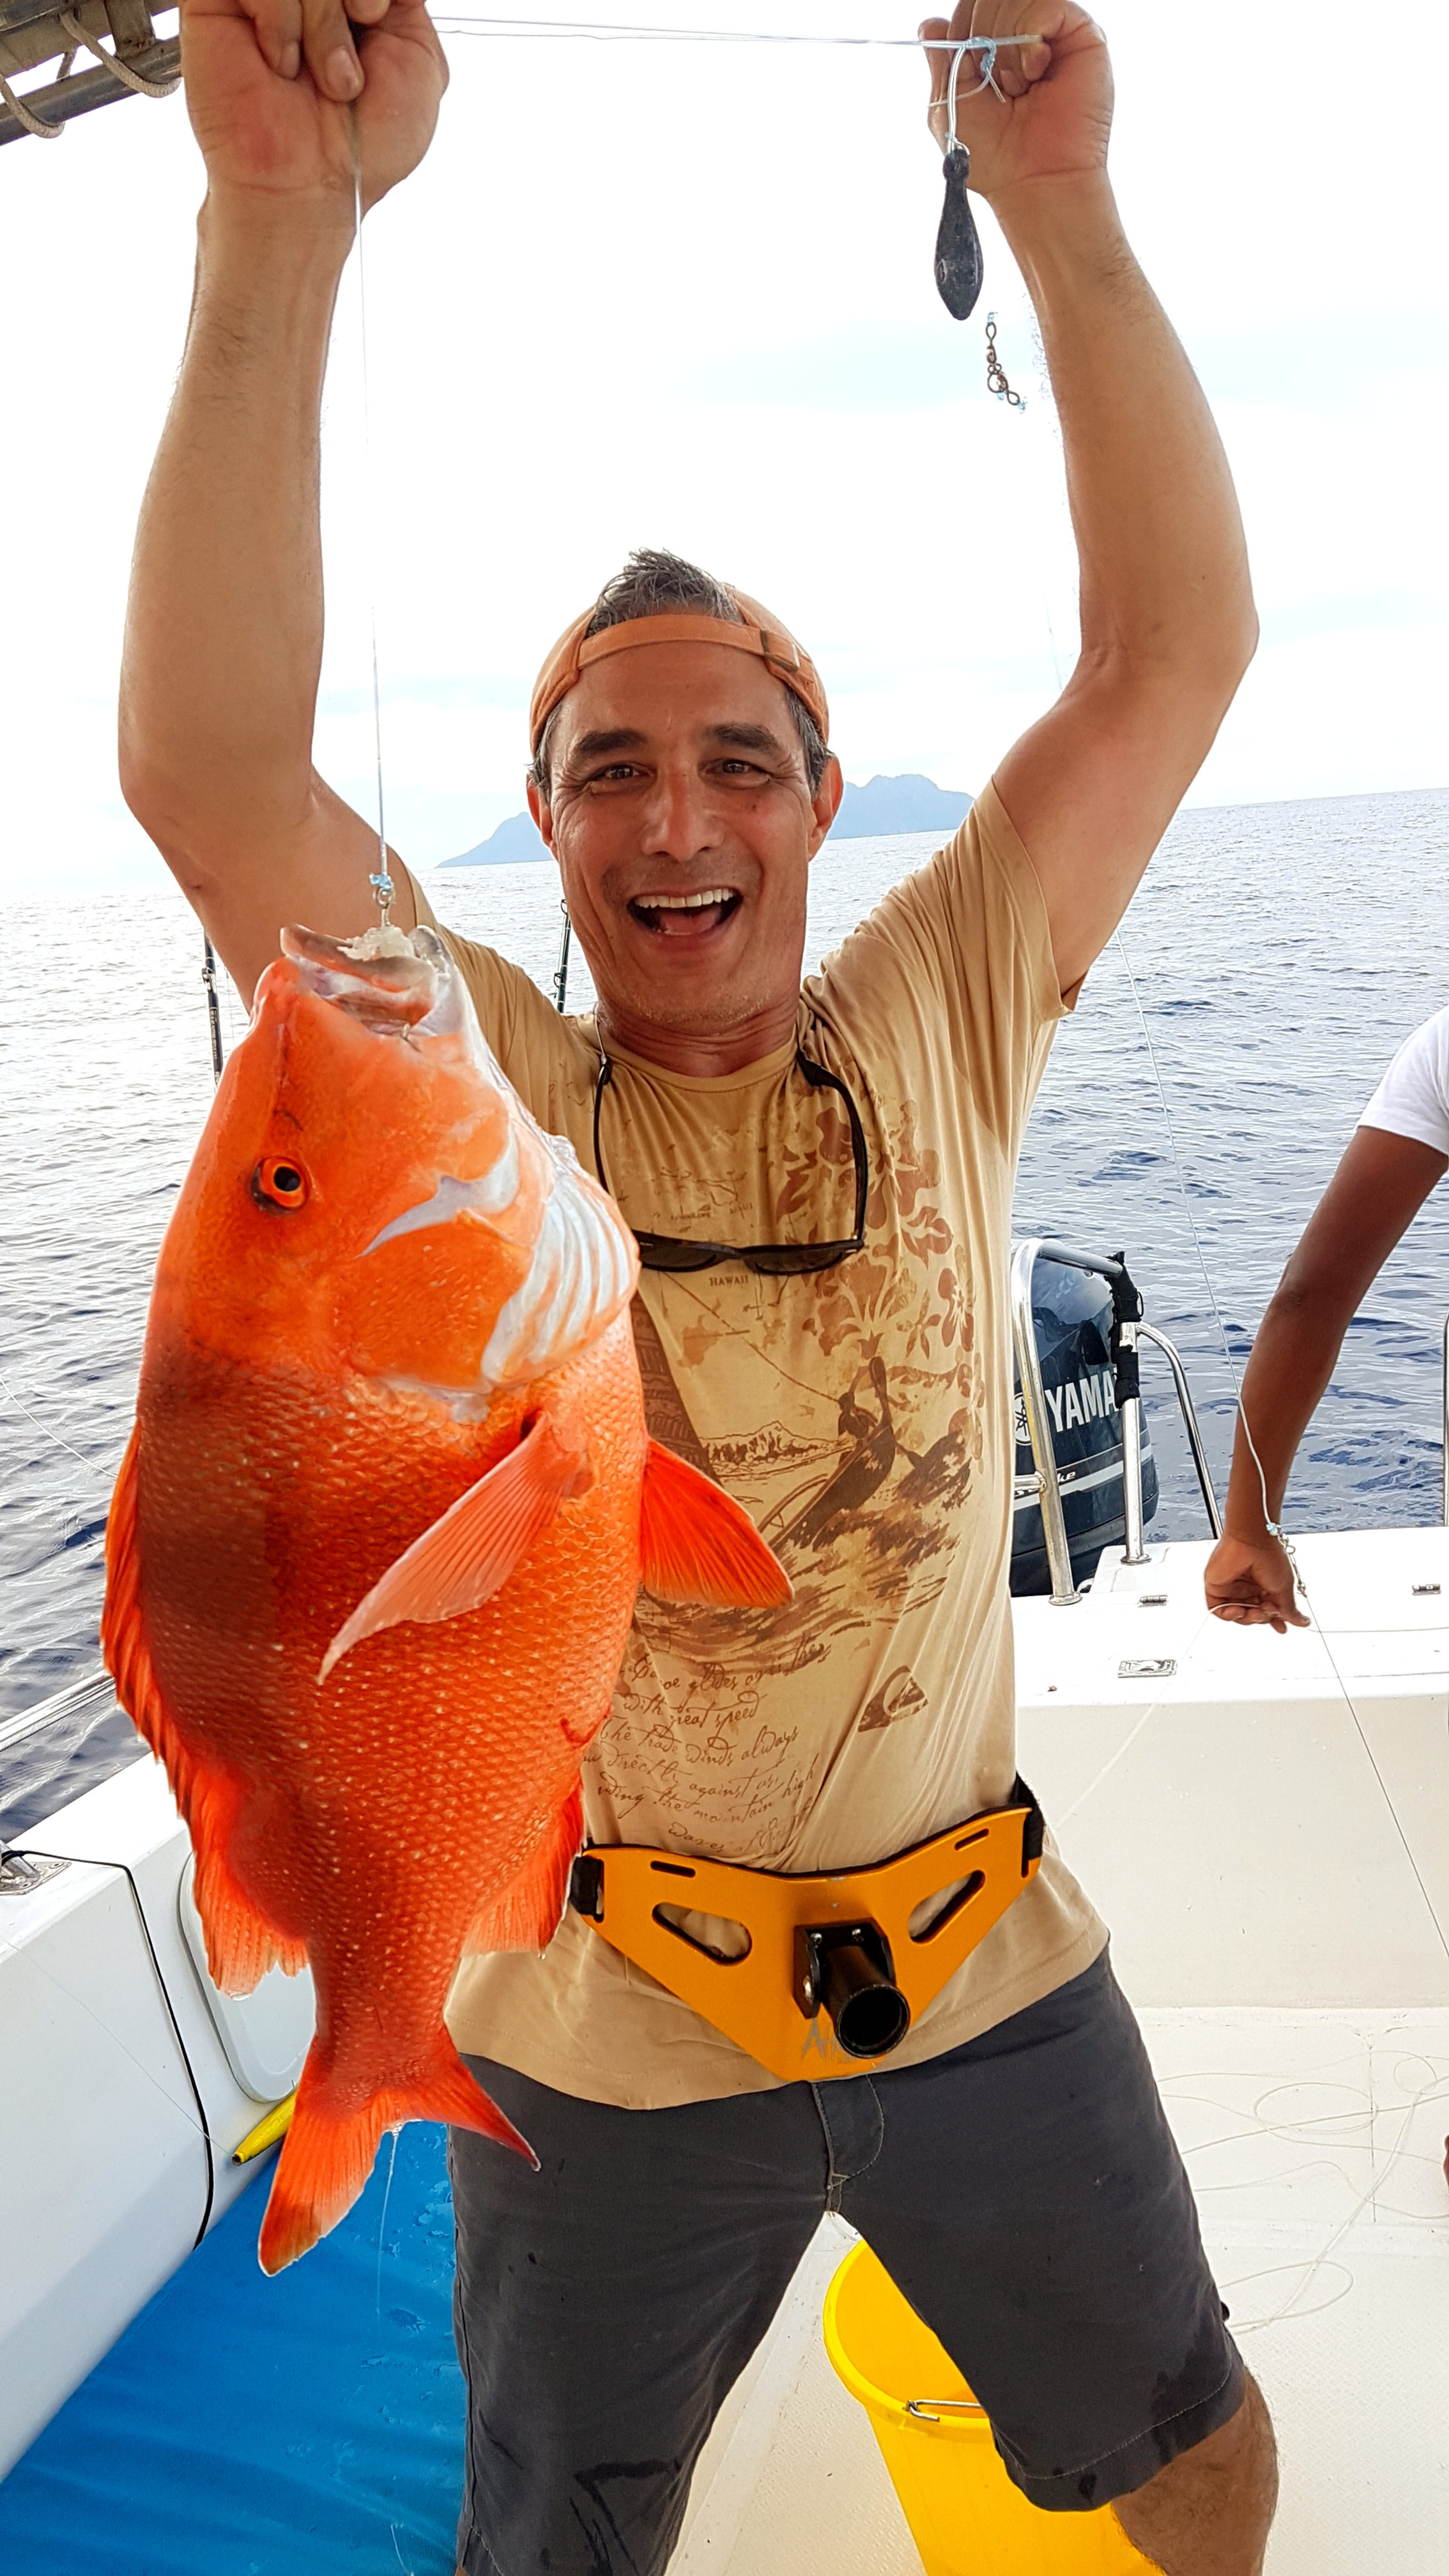 HALF DAY SPORT FISHING